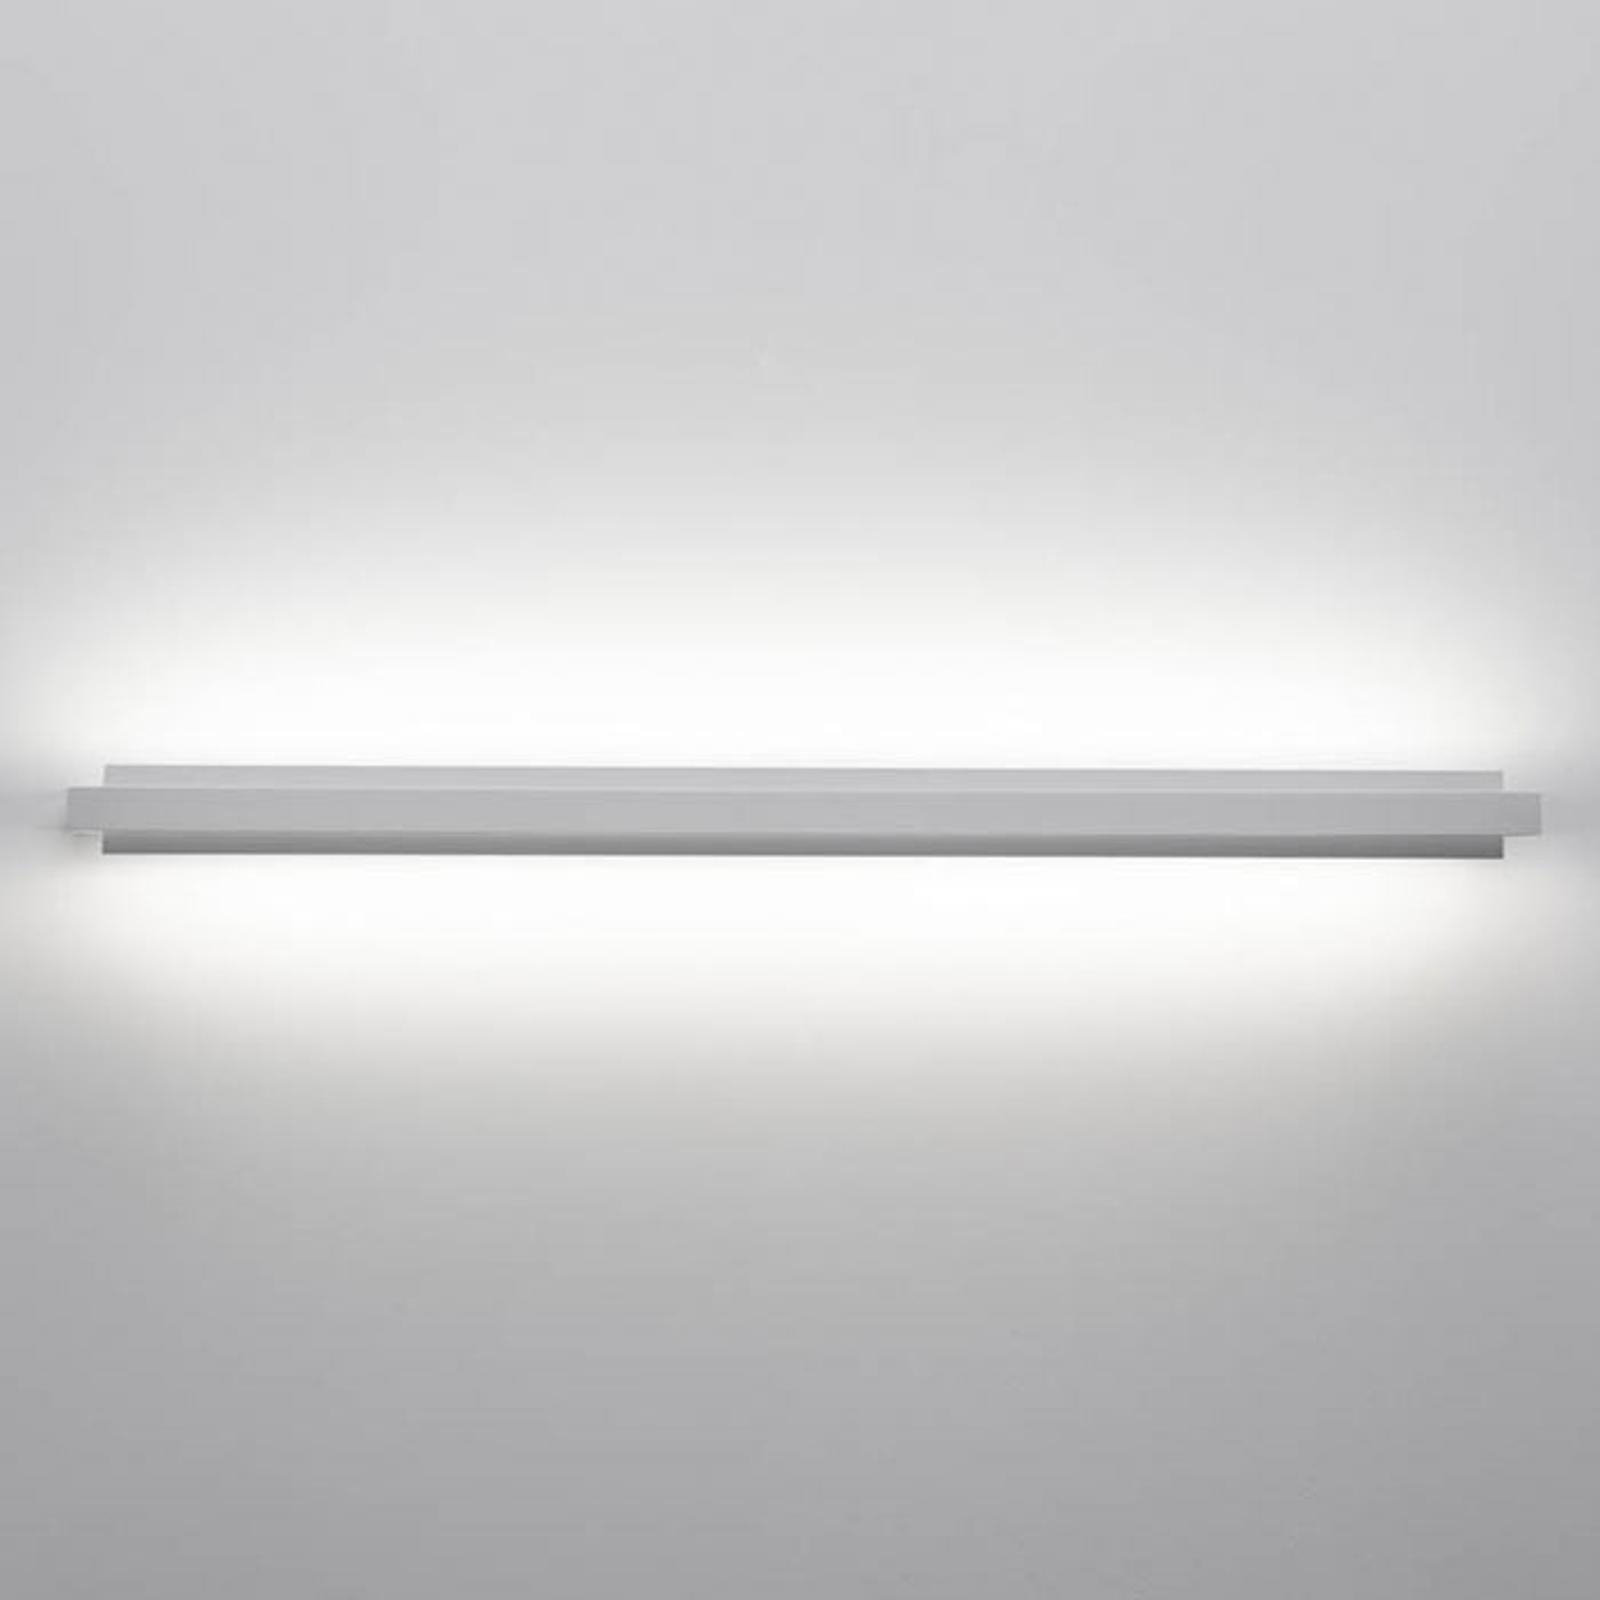 LED wandlamp tablet W1, breedte 66 cm, wit